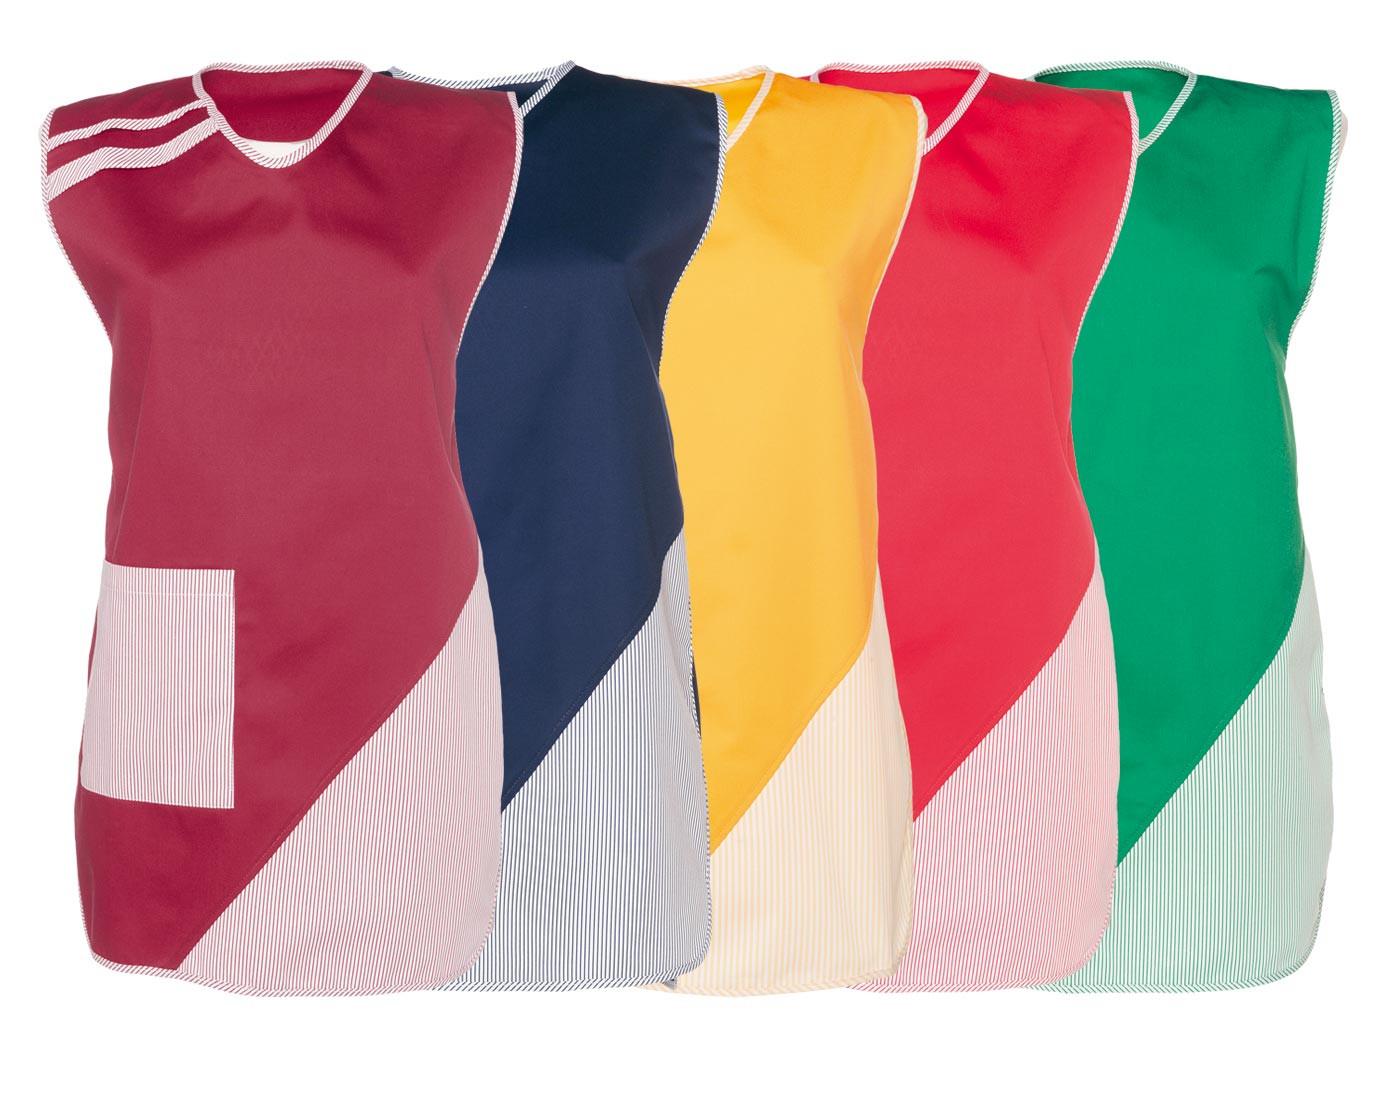 Damen-Überwurfkittel - zweifarbig - kurz